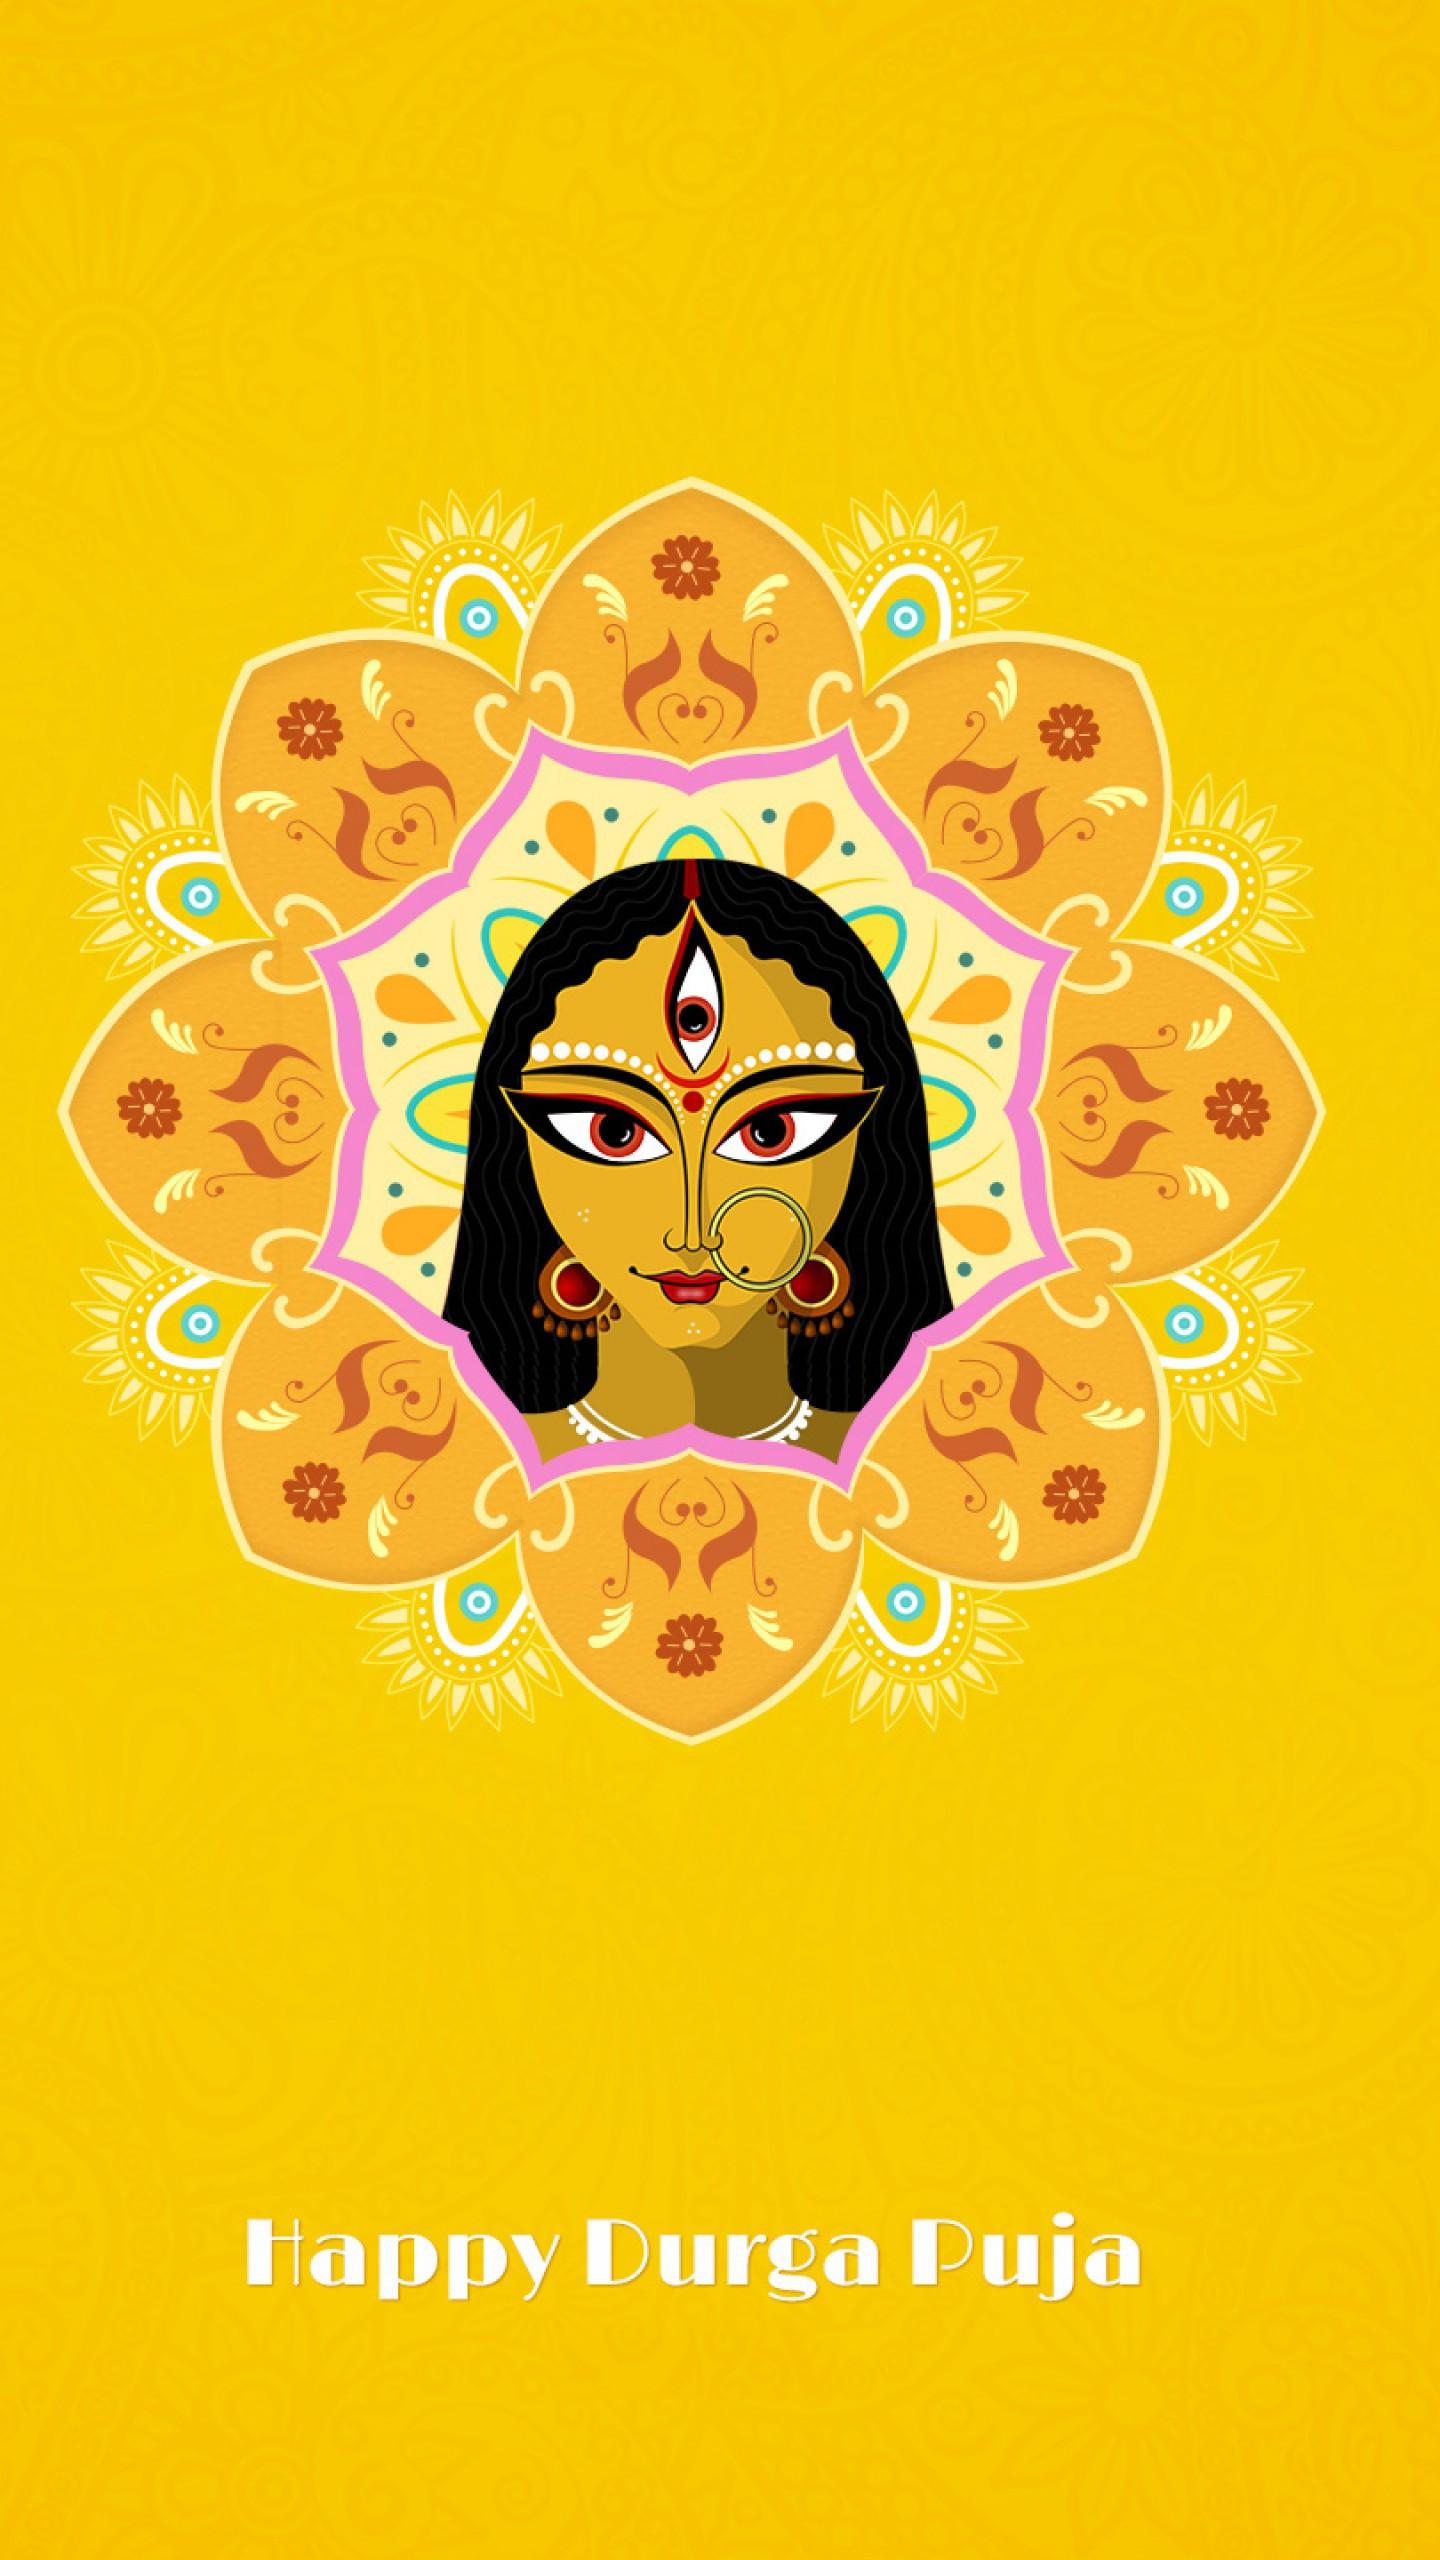 عکس زمینه زن سه چشم در جشنواره دورگا پوجا هندی پس زمینه